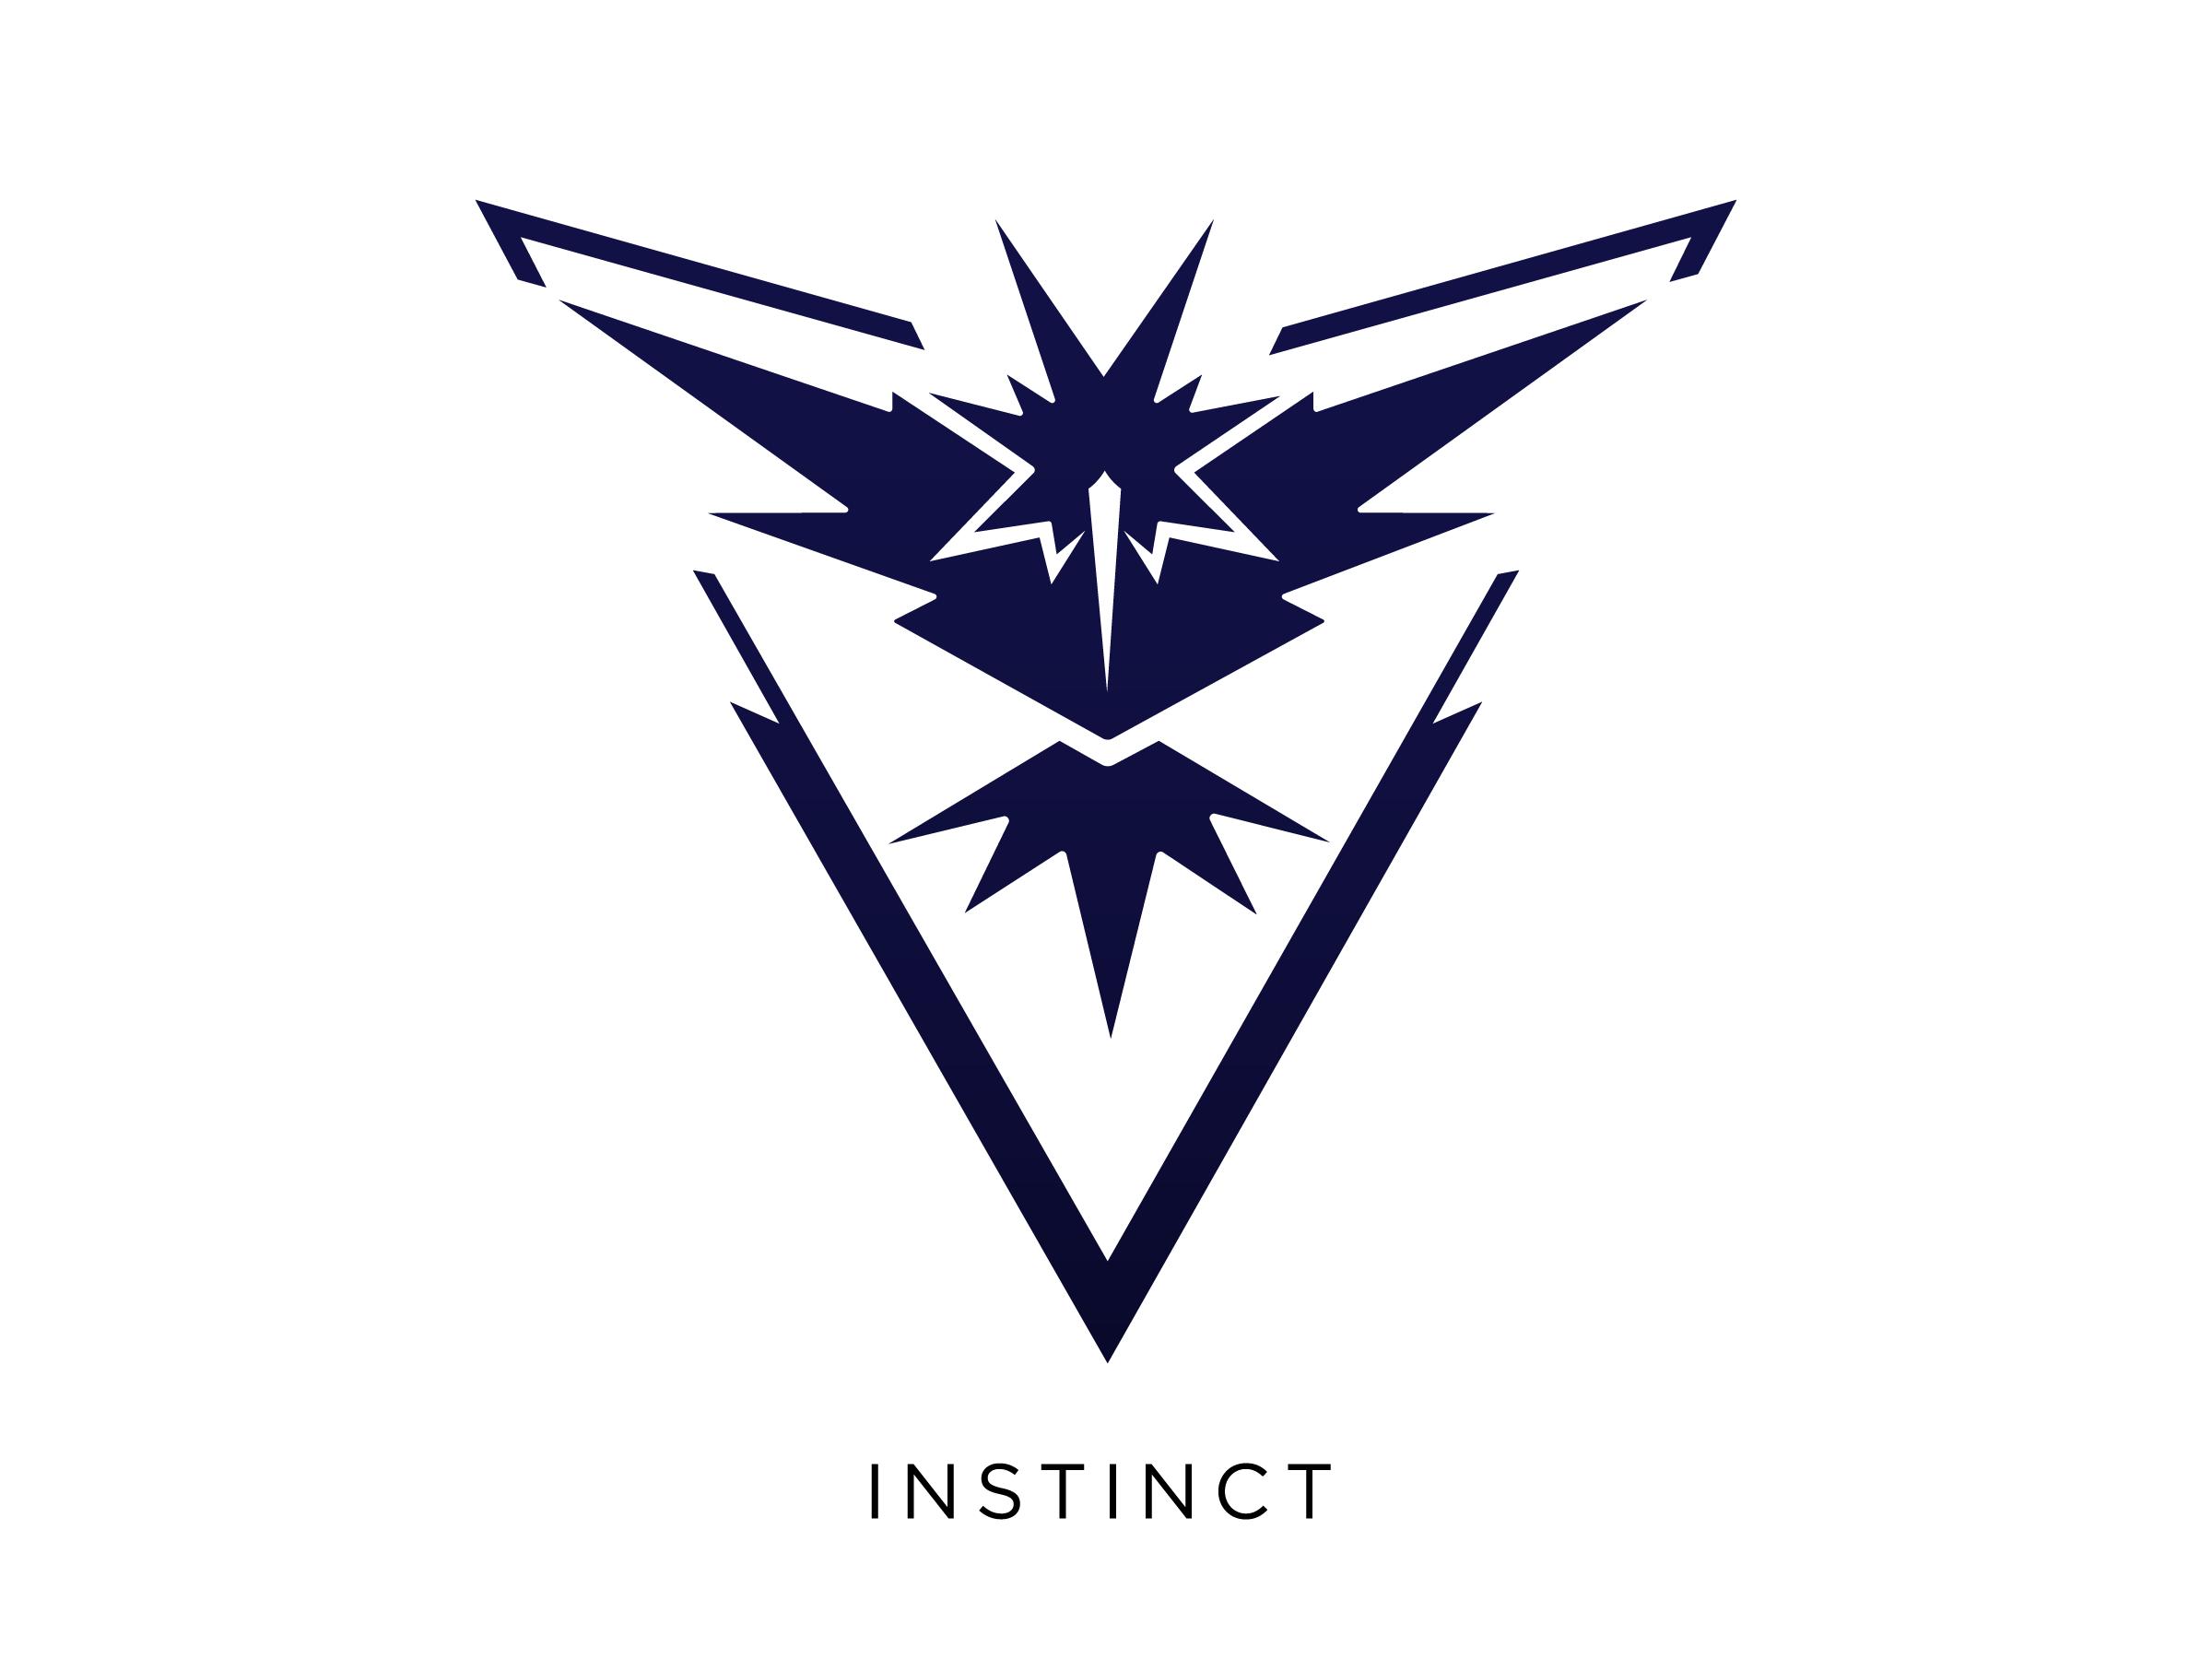 2400x1800 Go Team Logos [Vector Download] By Meritt Thomas